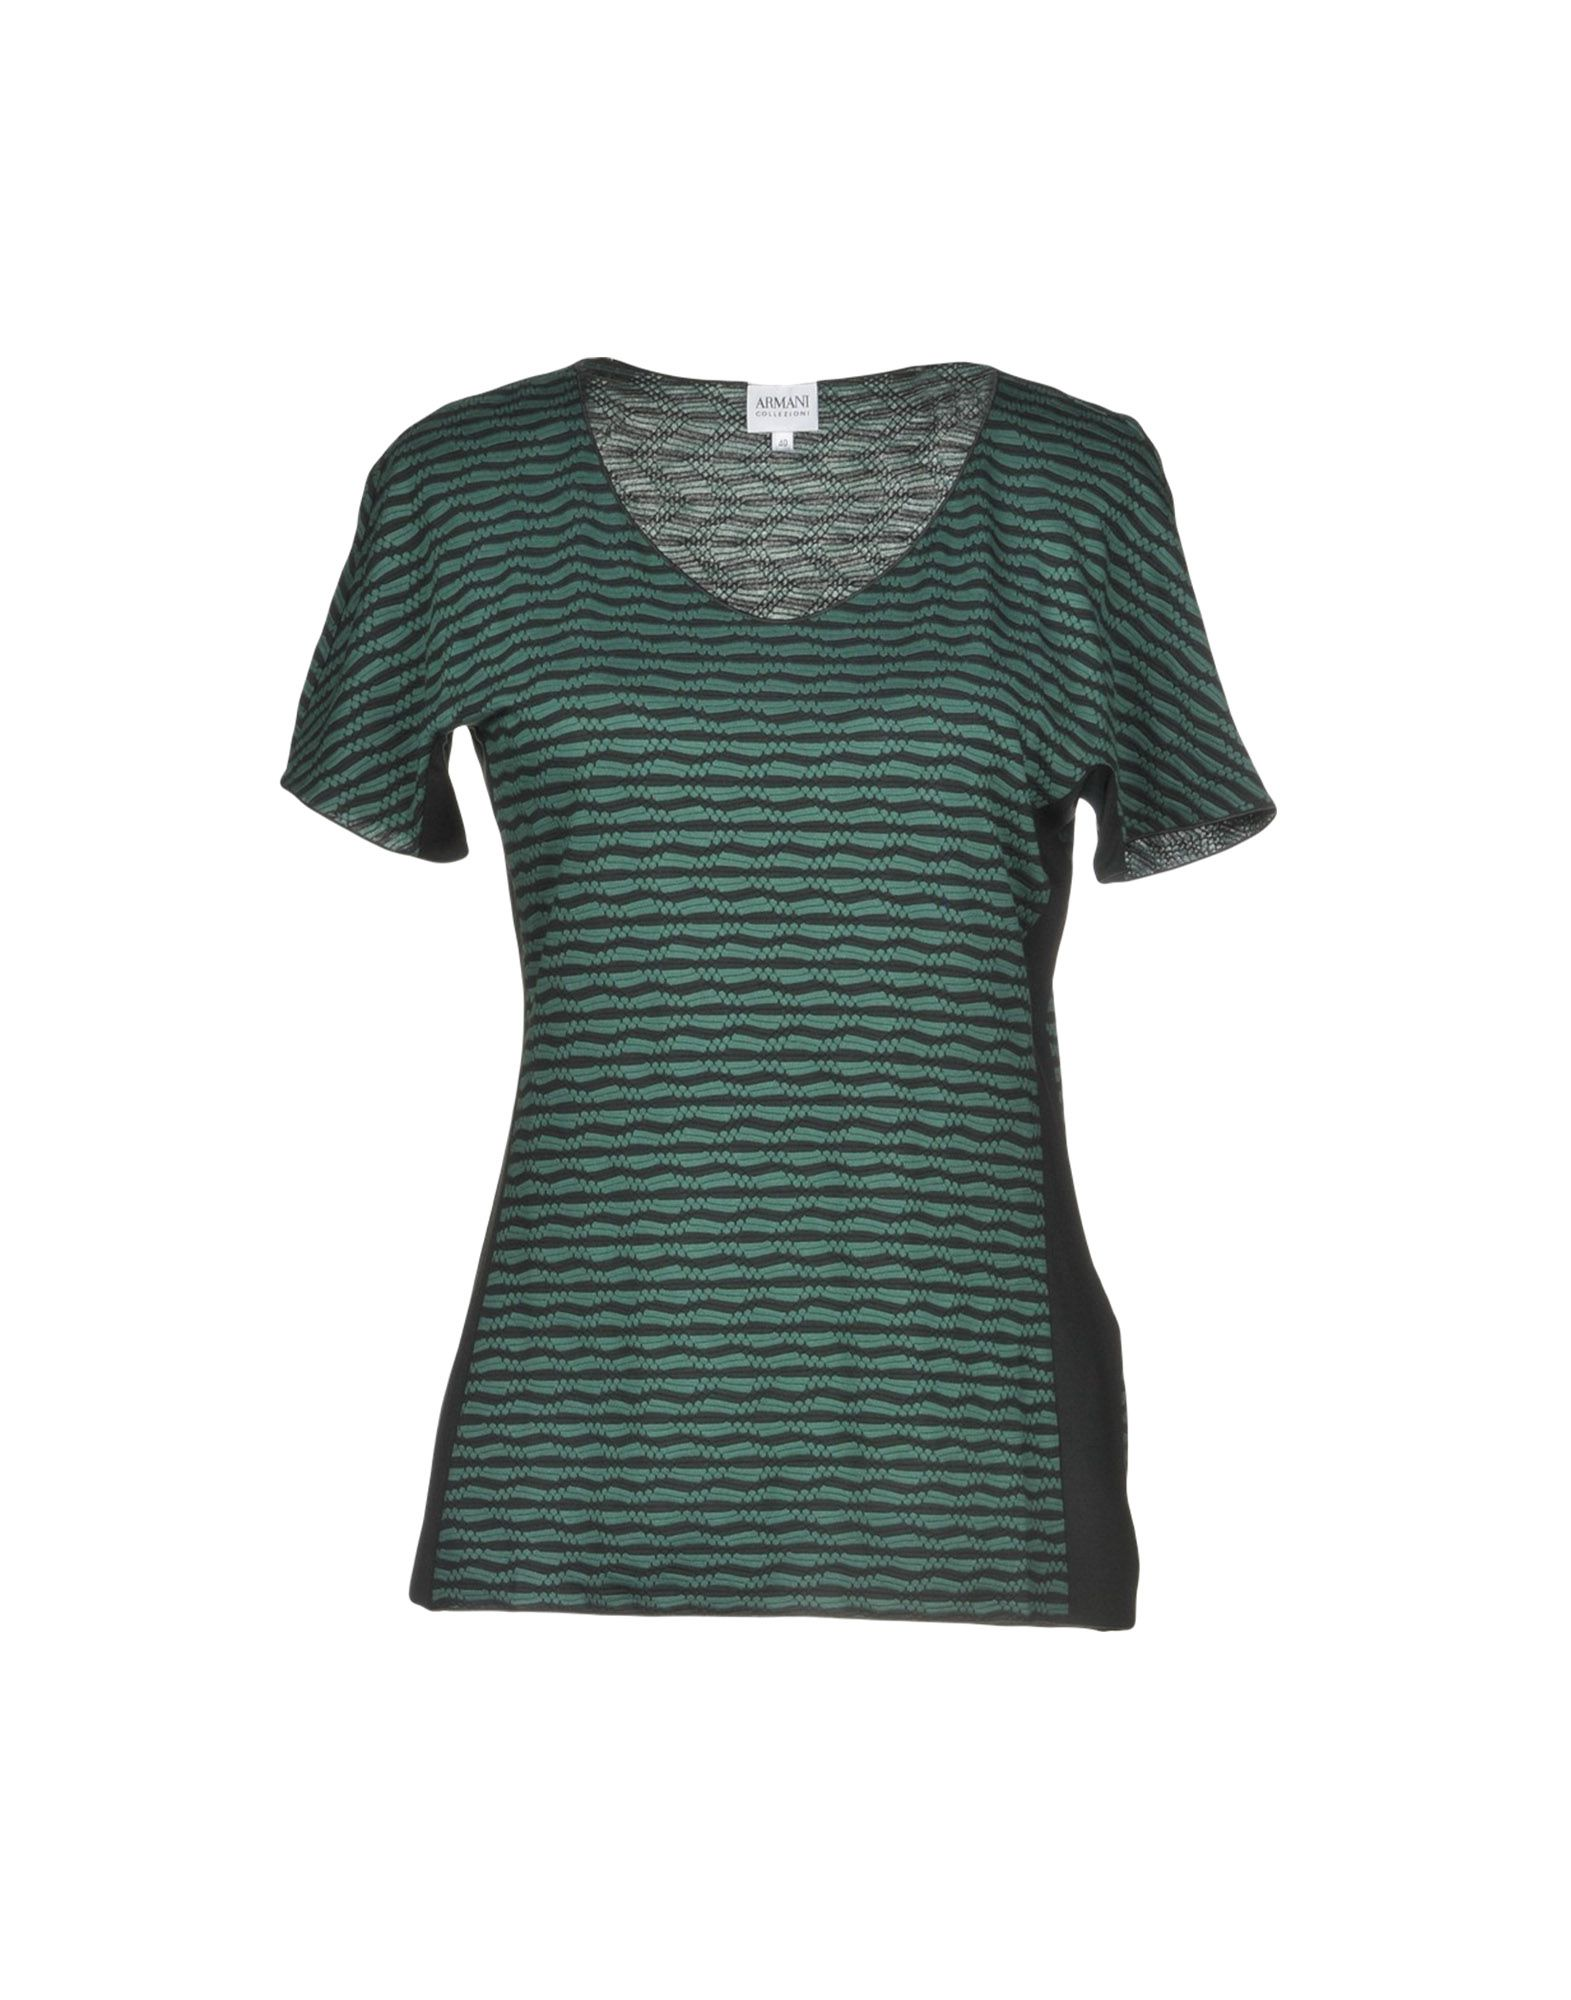 ARMANI COLLEZIONI Футболка пуловер armani collezioni джемперы свитера и пуловеры короткие